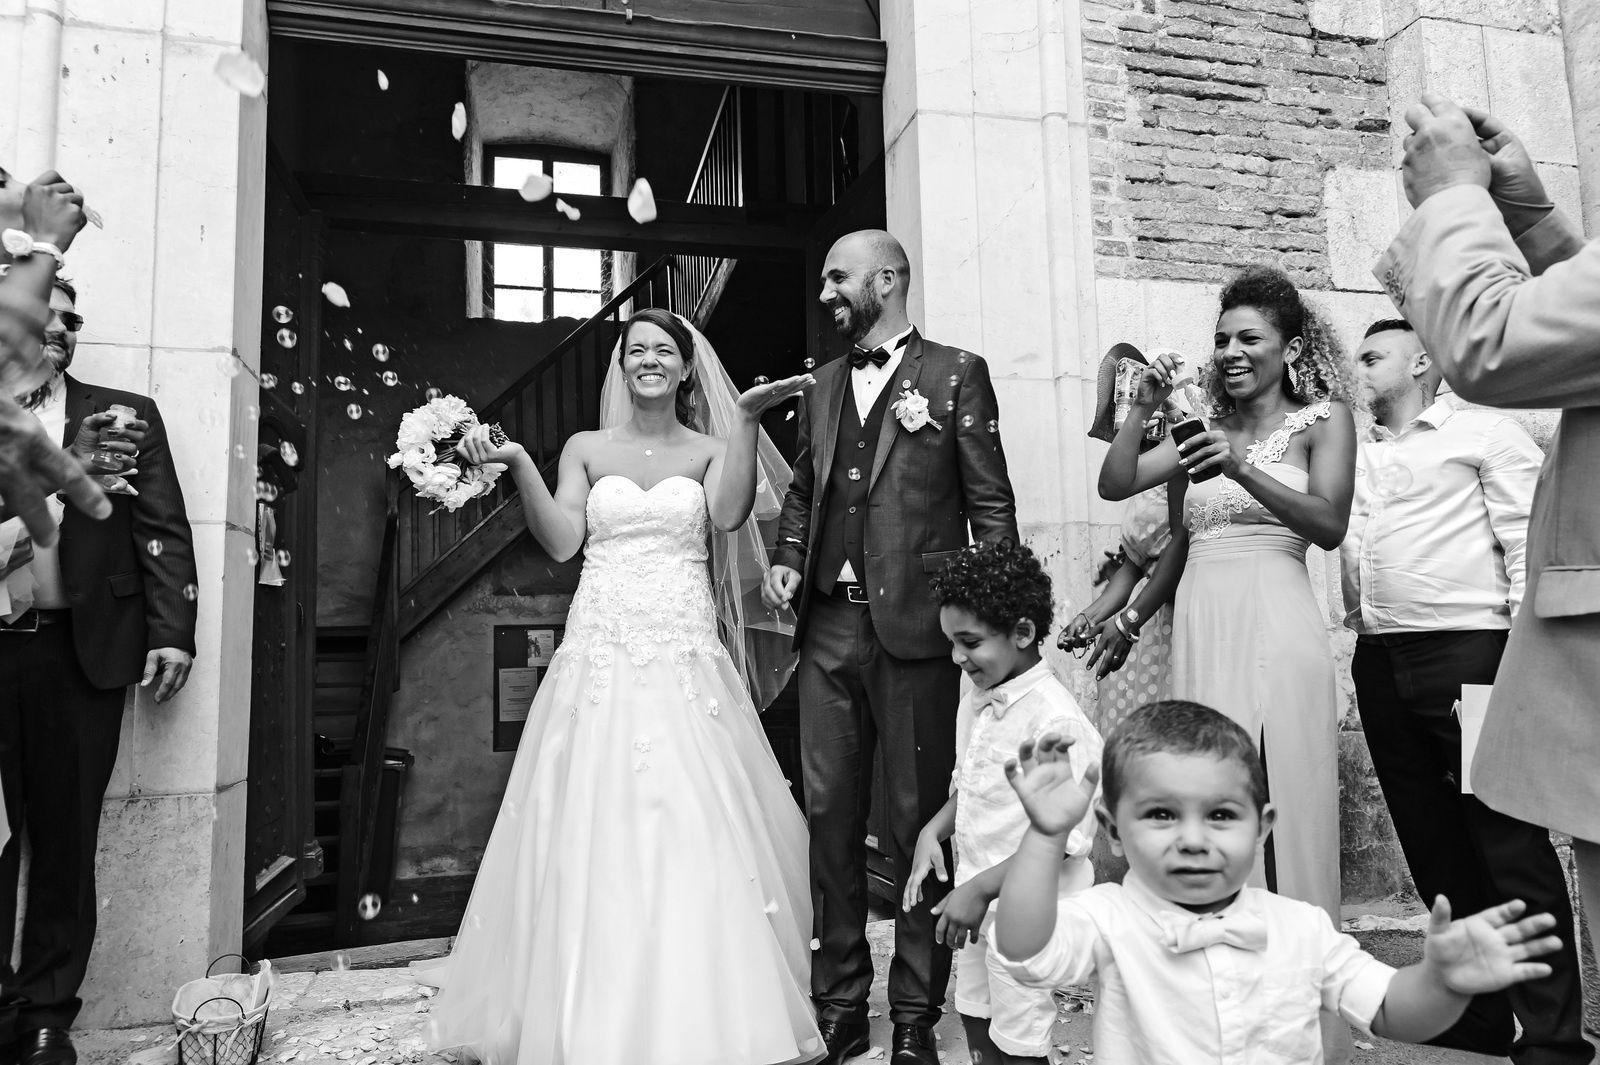 Photographe Lille, yann lecomte photographies(c) #photographelille #photographemariagelille #letempsdunepause #photographenord   #photographehautdefrance #yannlecomtephotographies #wedding #lille #mariage #nord #photographemariage